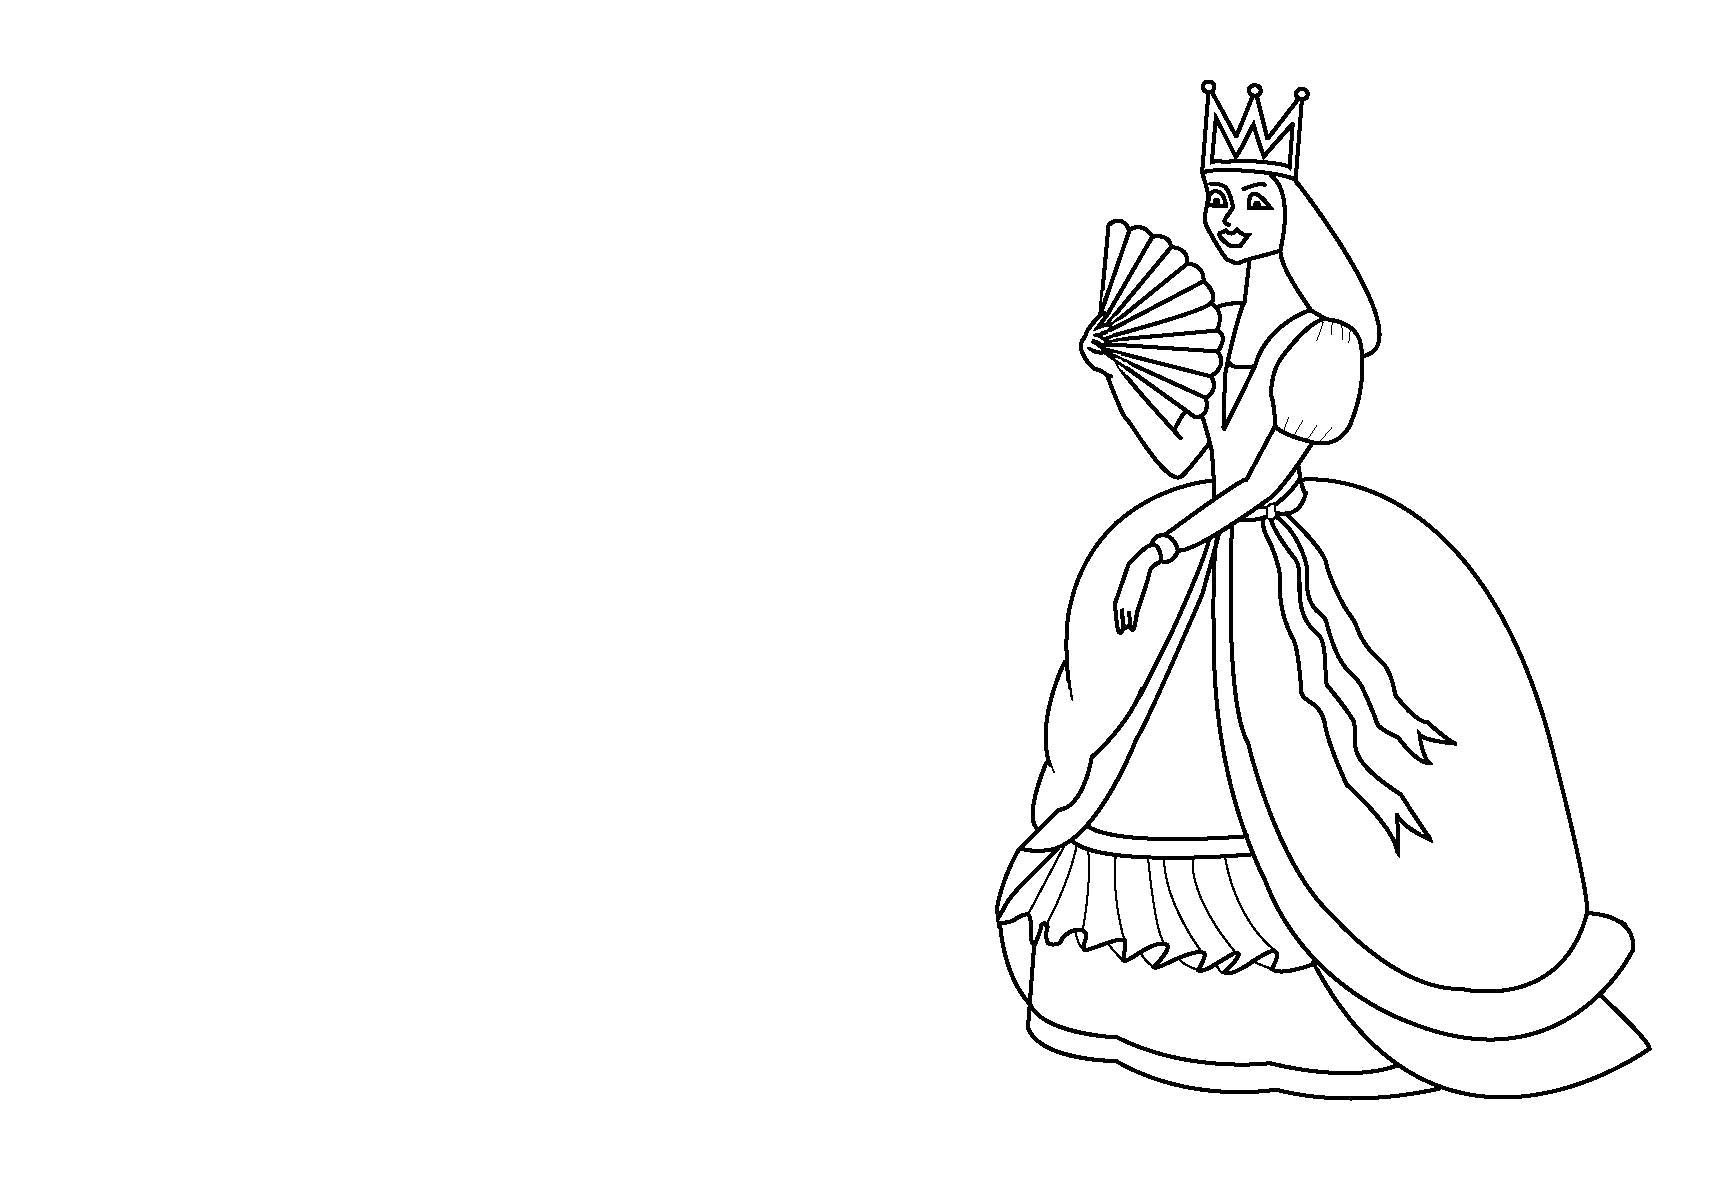 Раскраска  с принцессами. Скачать принцесса.  Распечатать принцесса